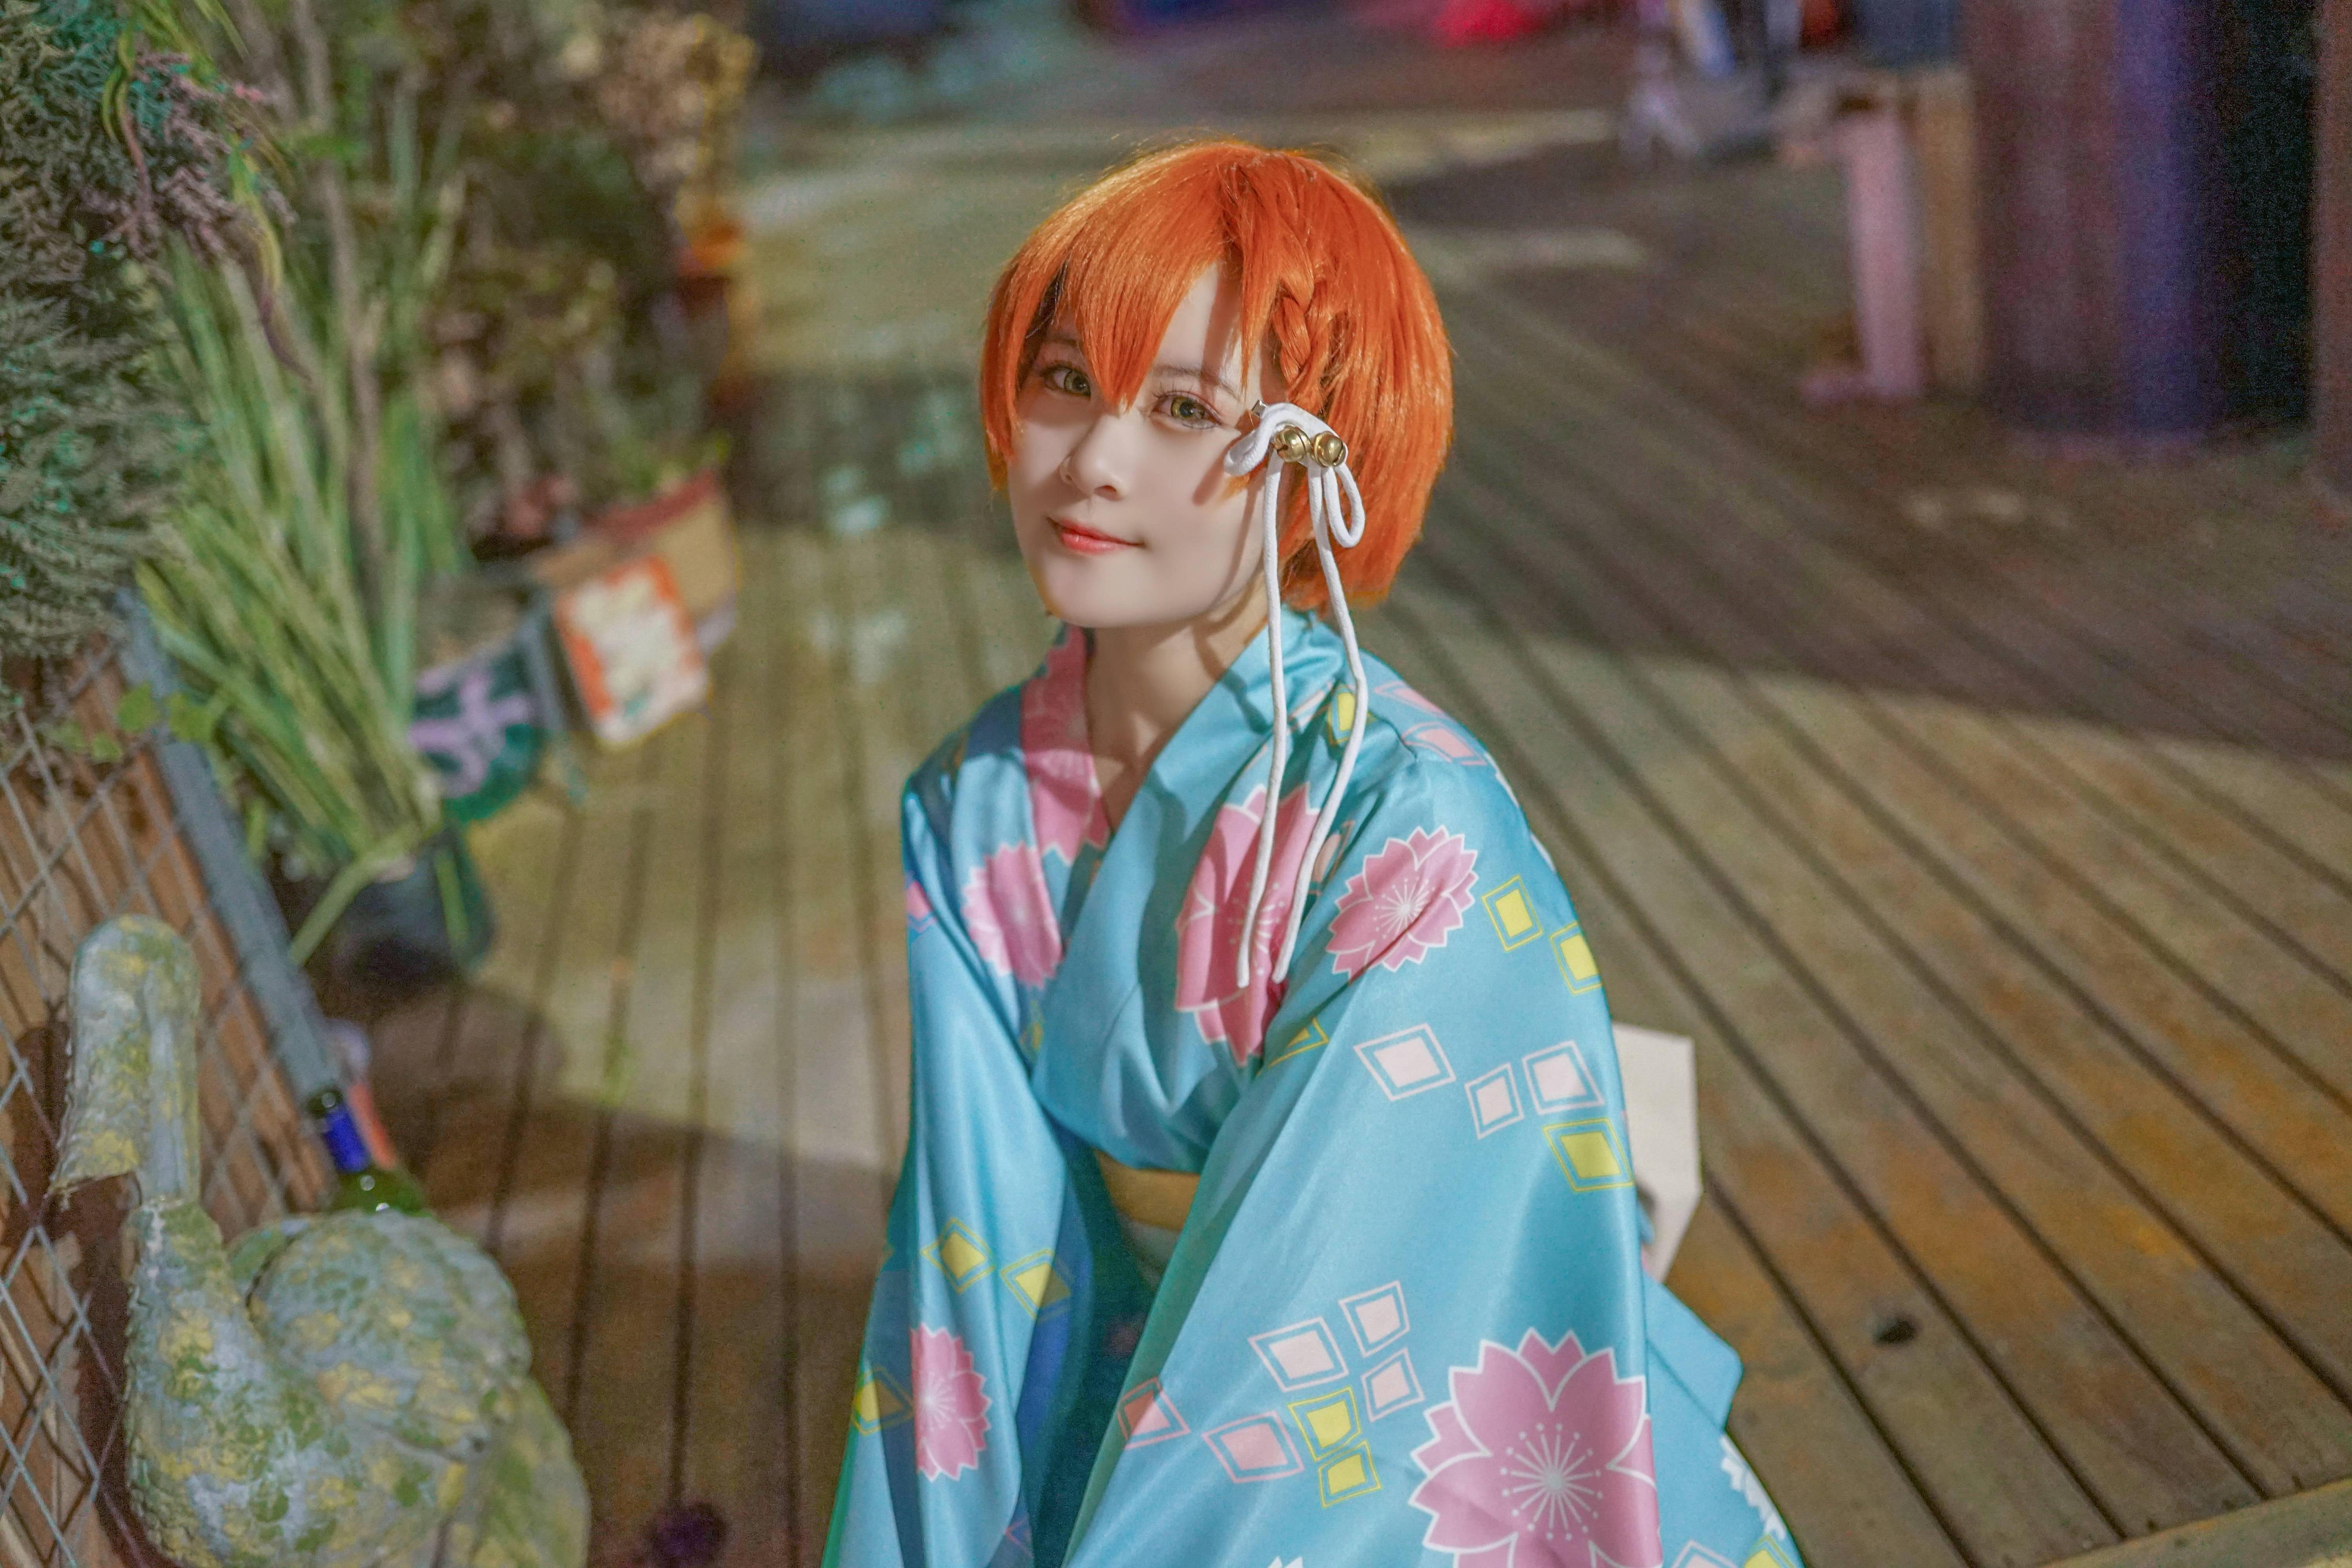 《LOVE LIVE!》萌妹cosplay【CN:_李笑颜Lee】-第12张